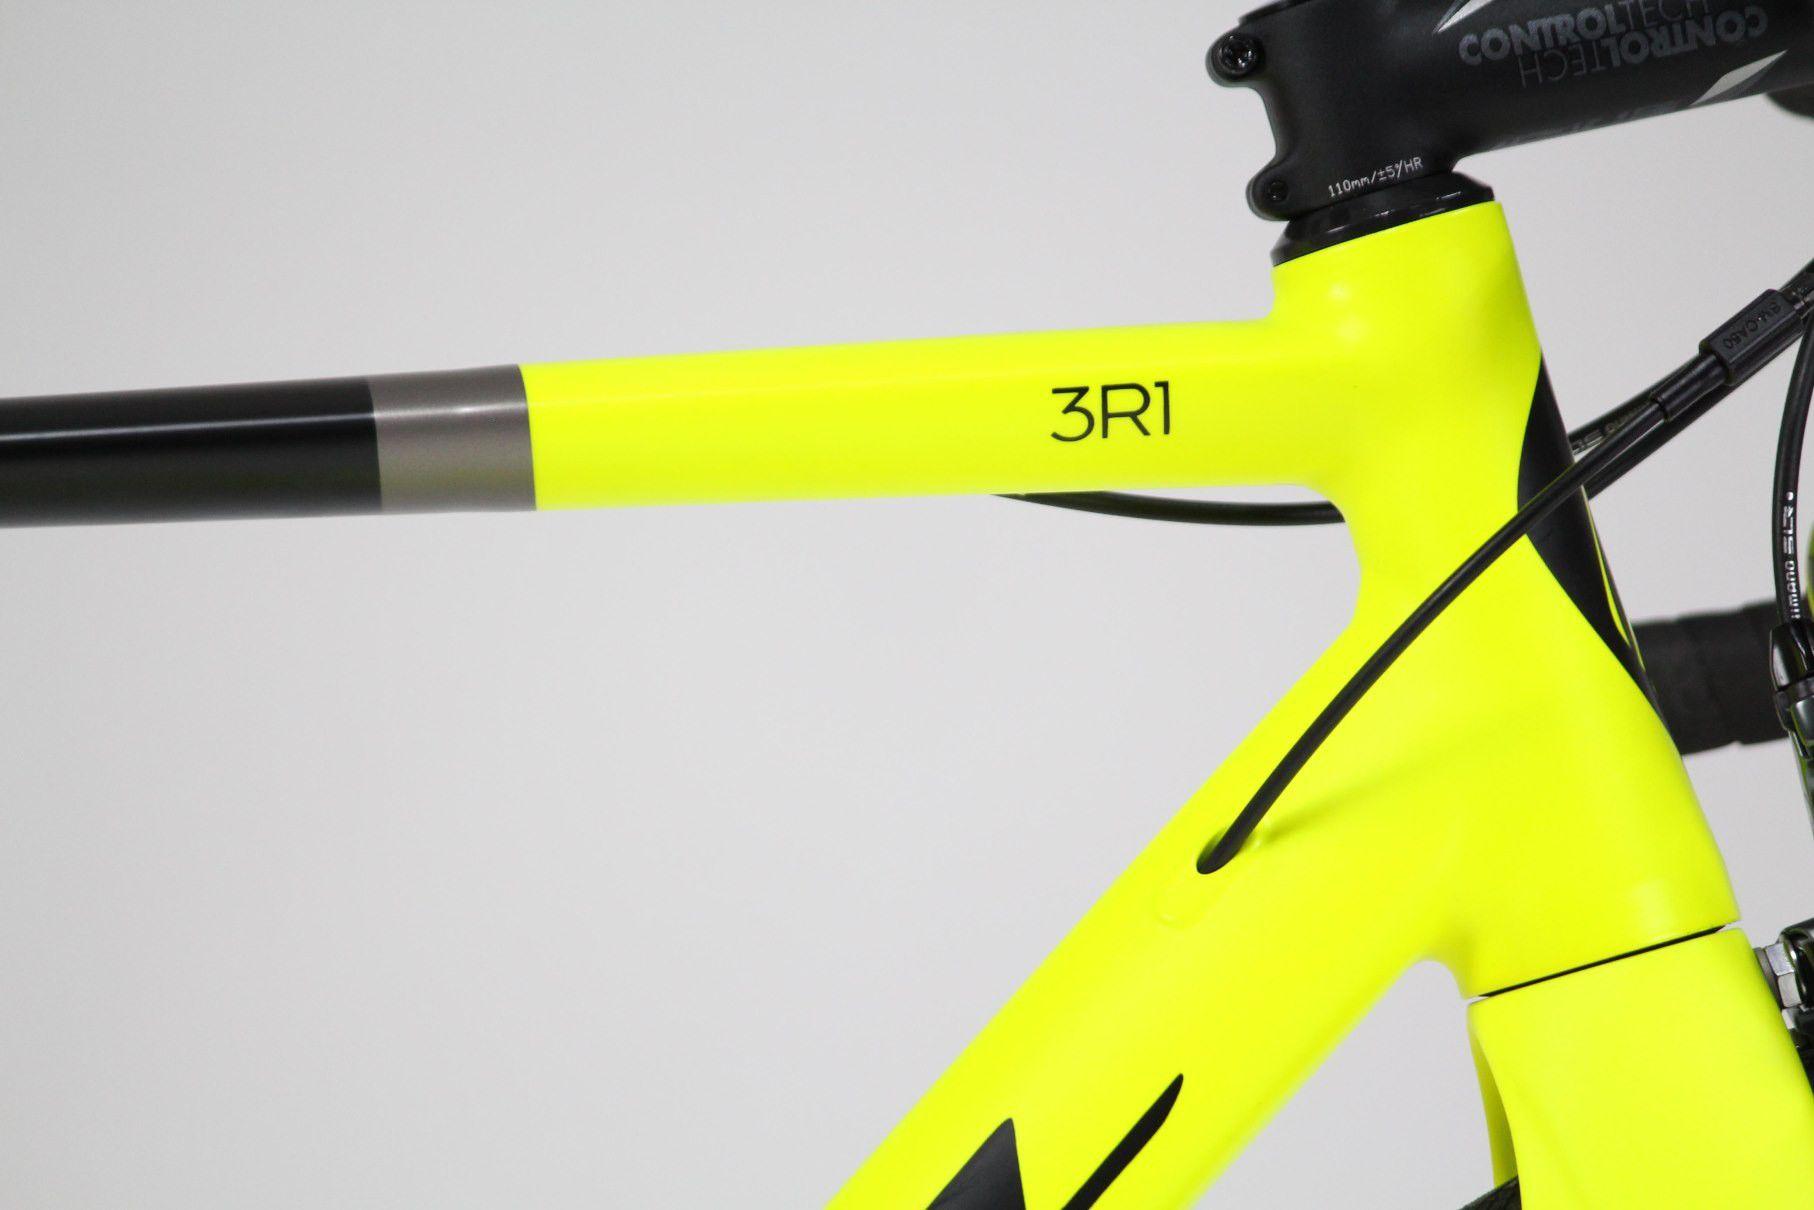 Bicicleta Speed Soul 3R1 Shimano Tiagra  20v Pto/Amarelo